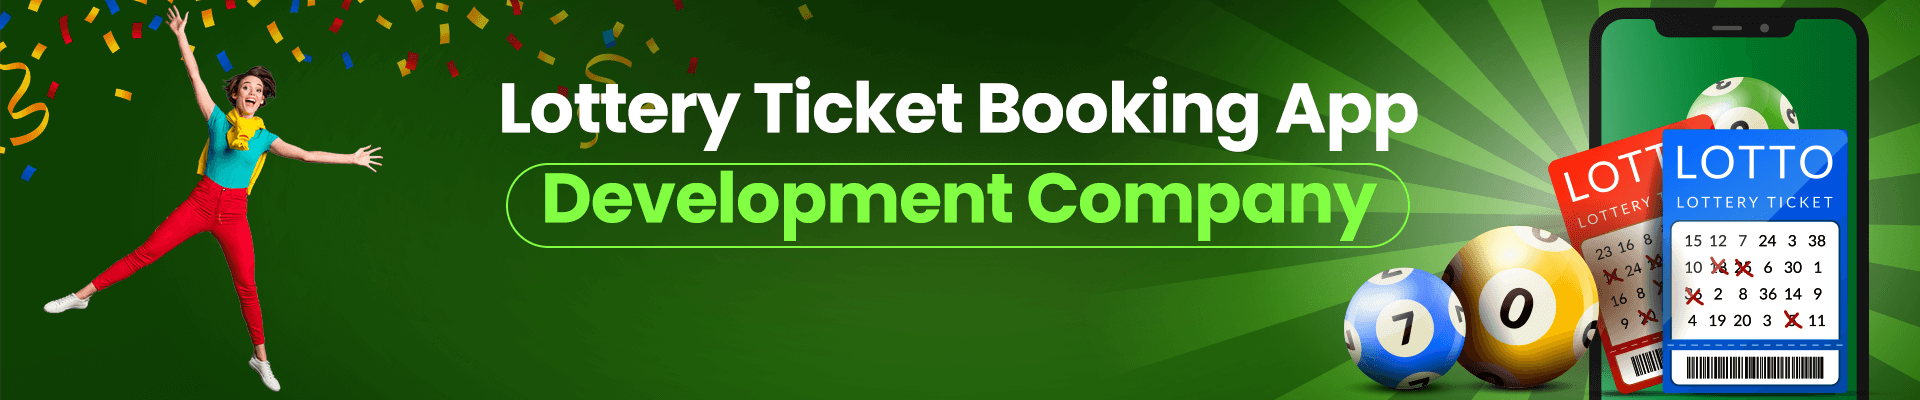 Best Lottery Ticket Booking App Development Company